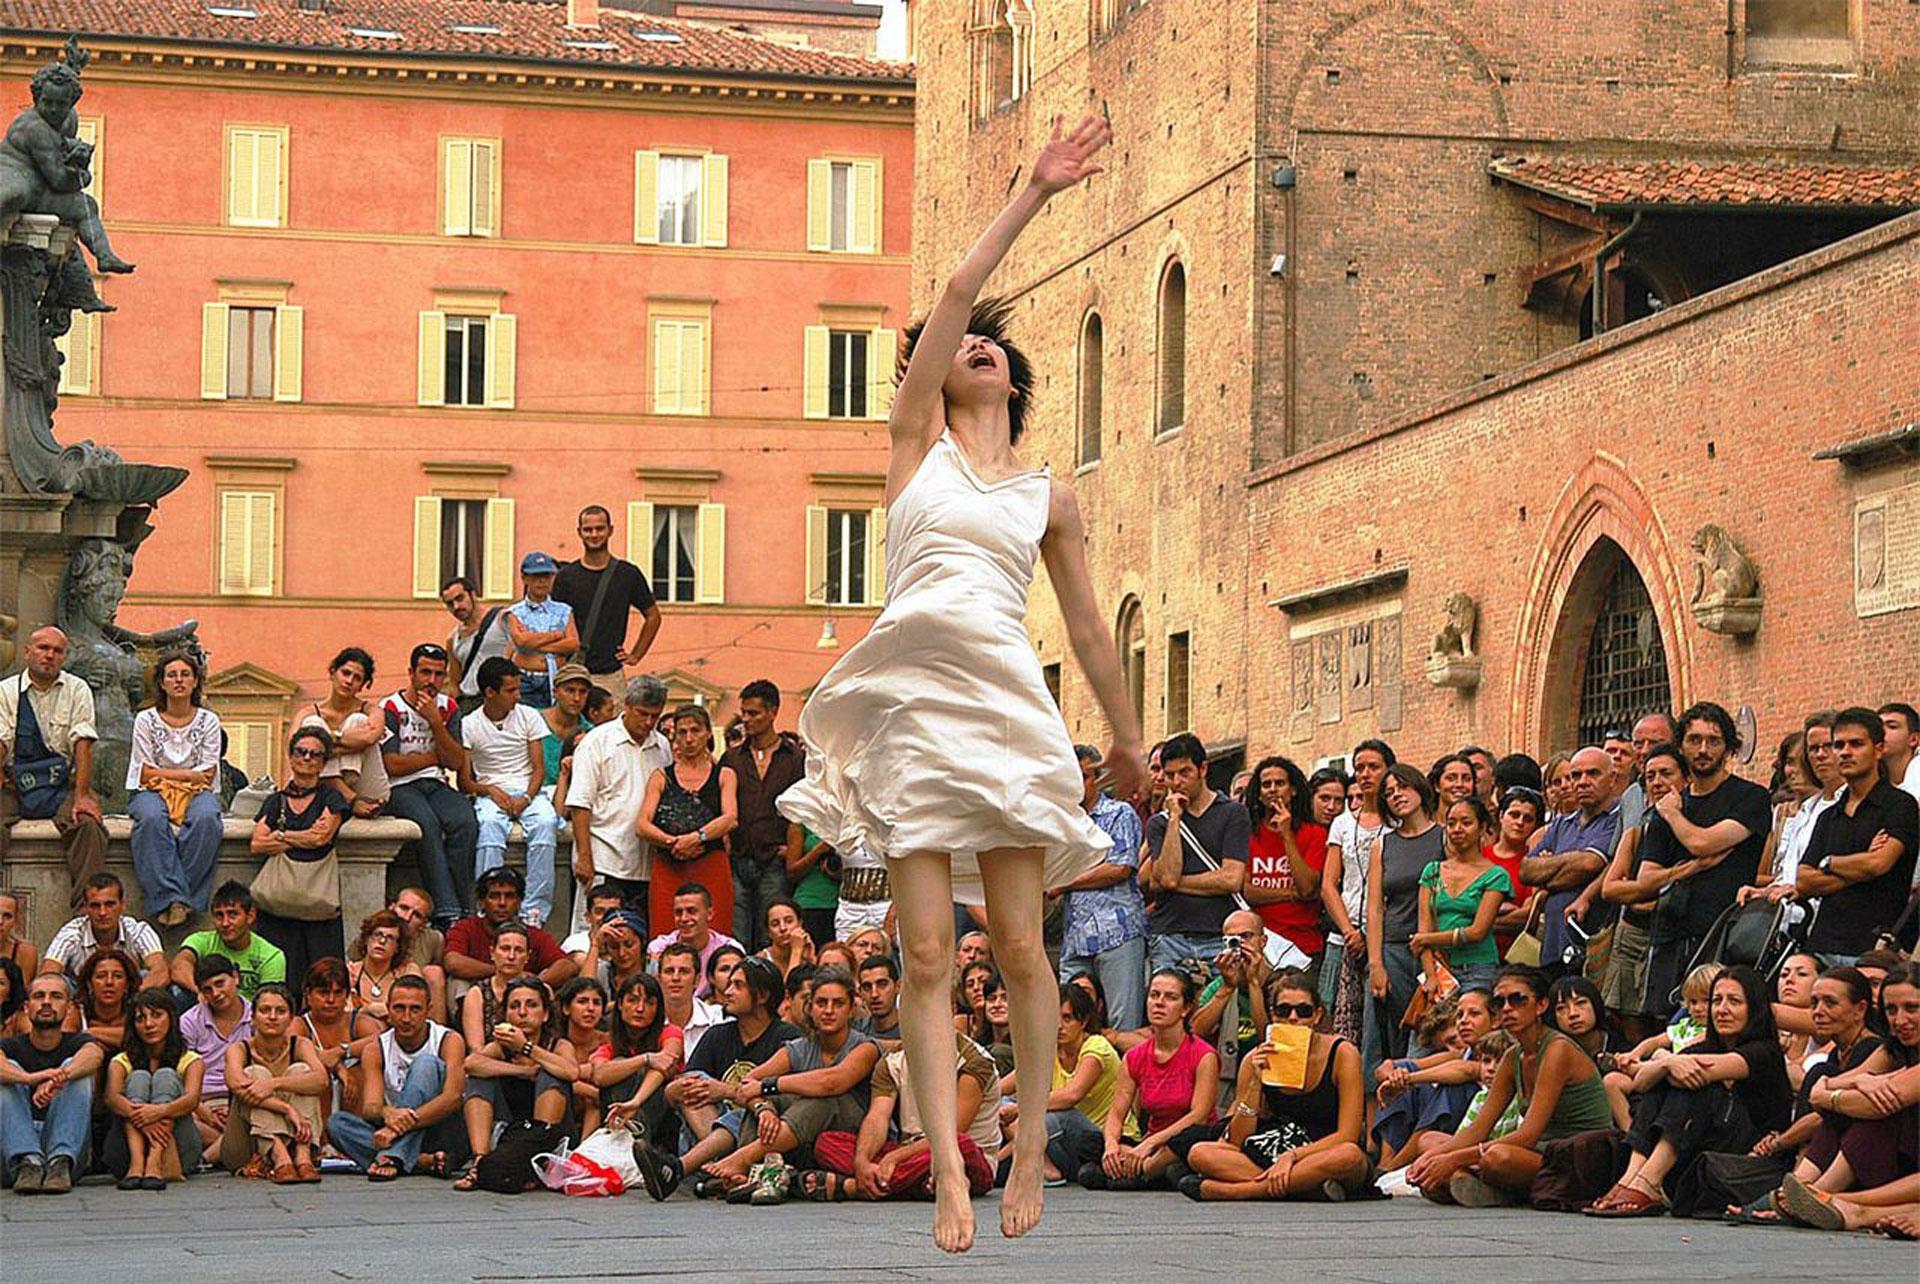 http://www.danzaurbana.eu/associazione/wp-content/uploads/2017/06/donatini2.jpg